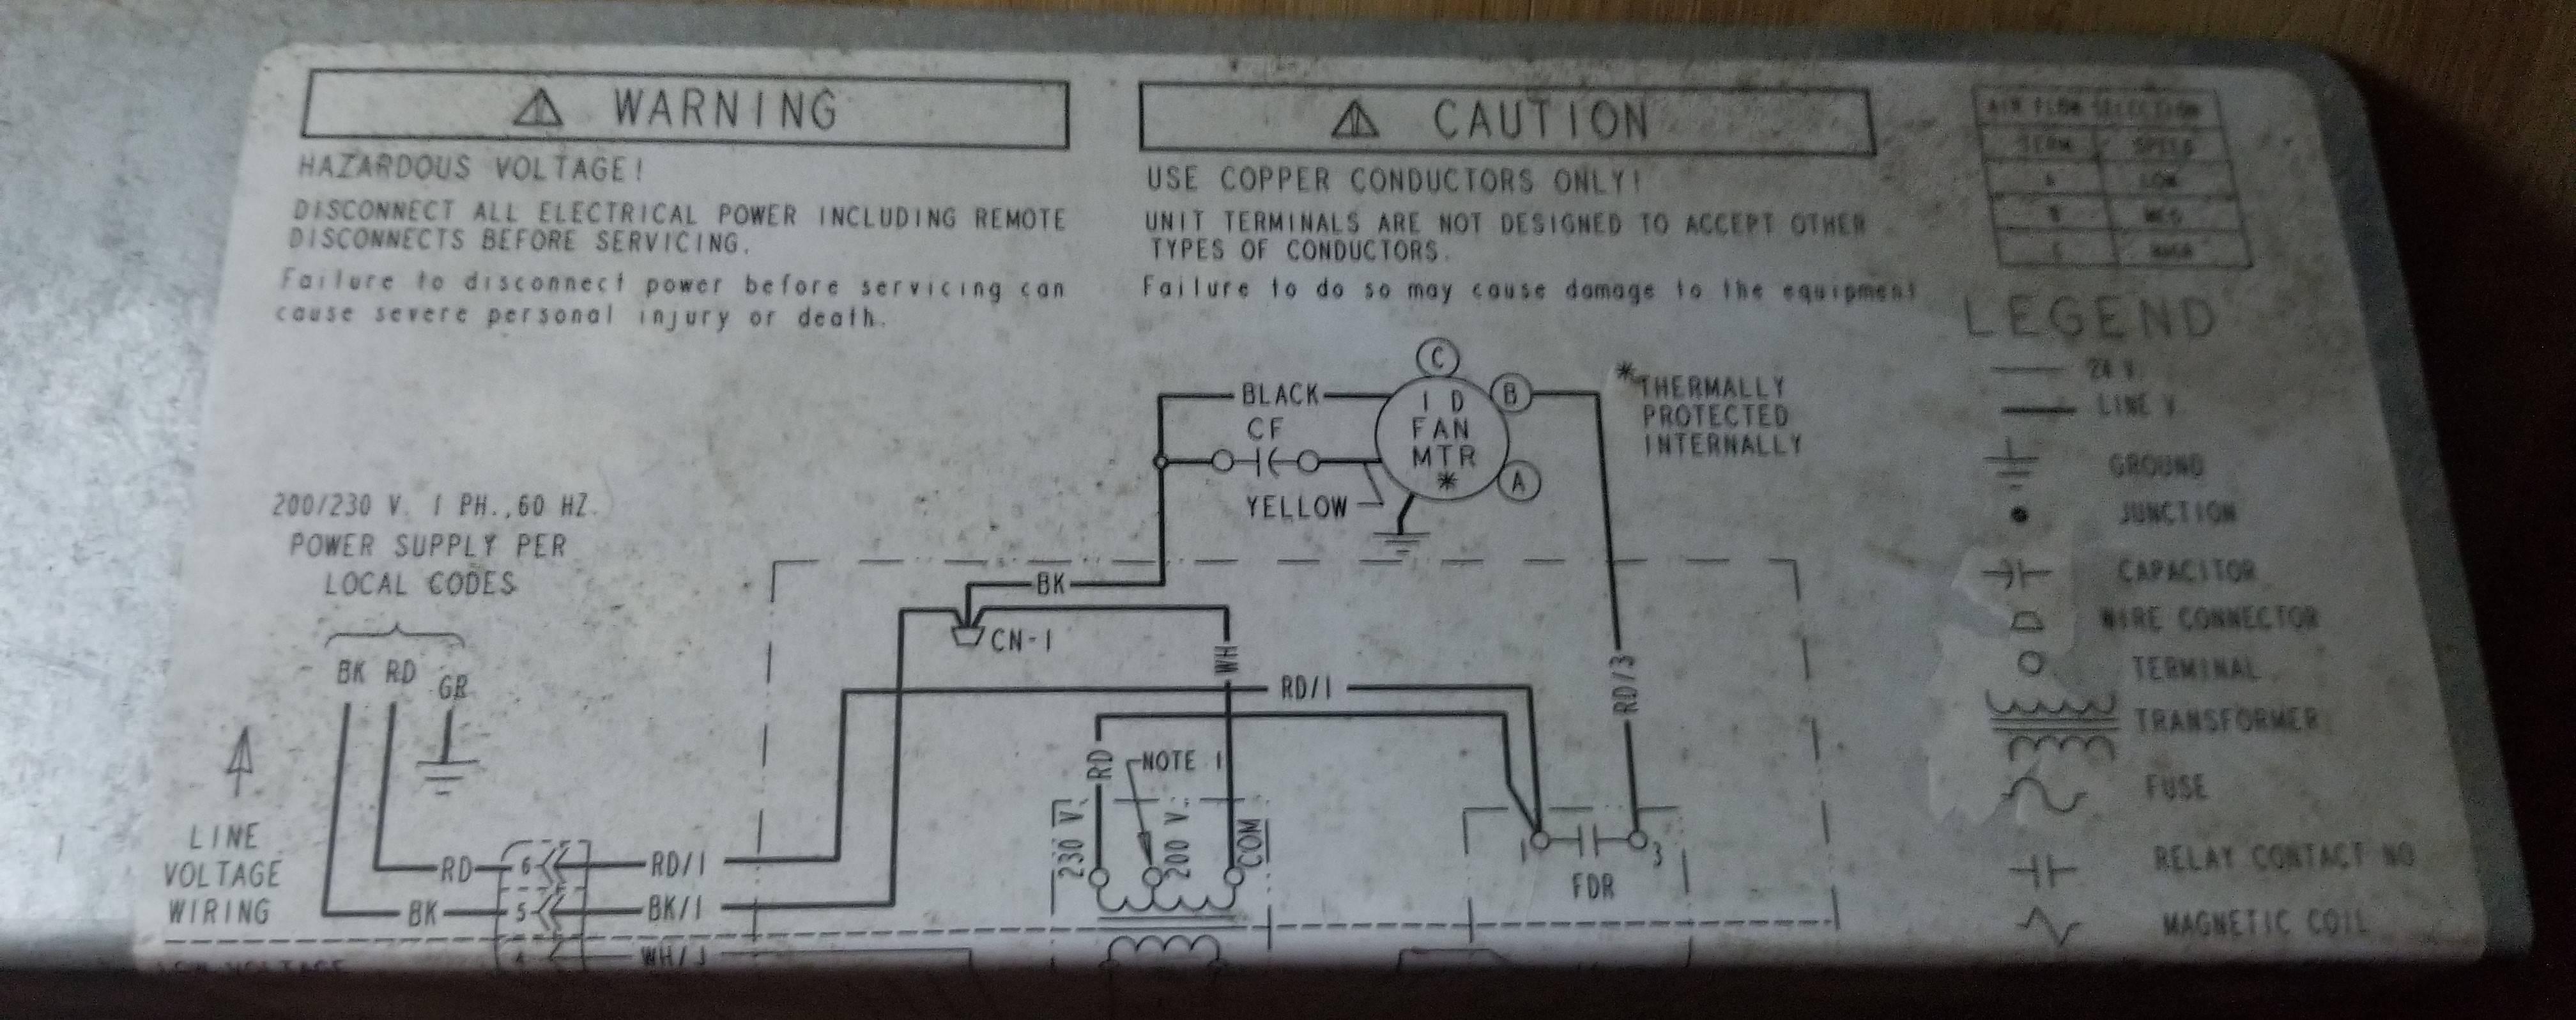 diagram] air handler fan relay wiring diagram full version hd quality wiring  diagram - healthydiagrams.rapfrance.fr  database design tool